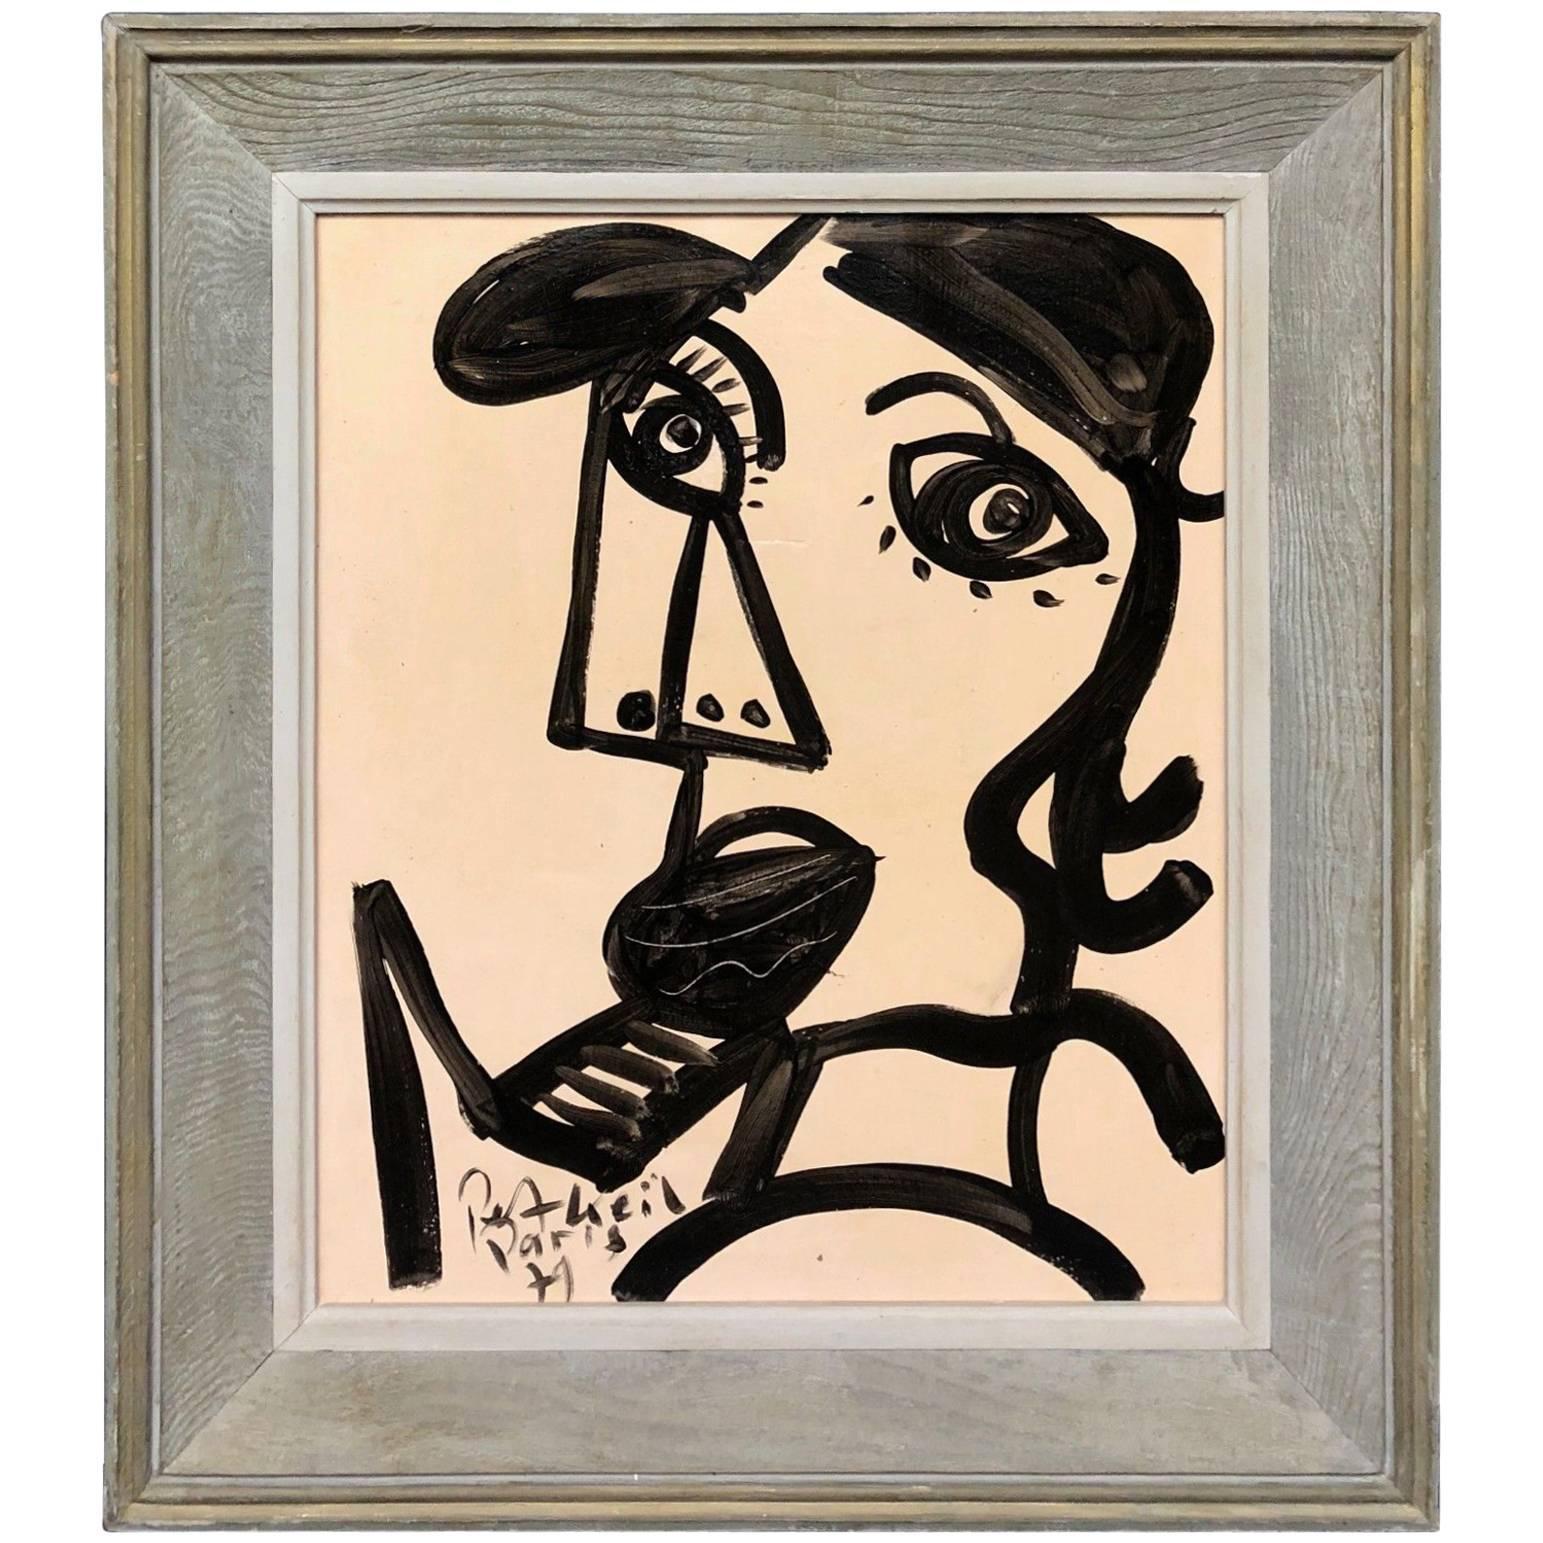 Peter Keil Framed Expressionist Oil Portrait Painting